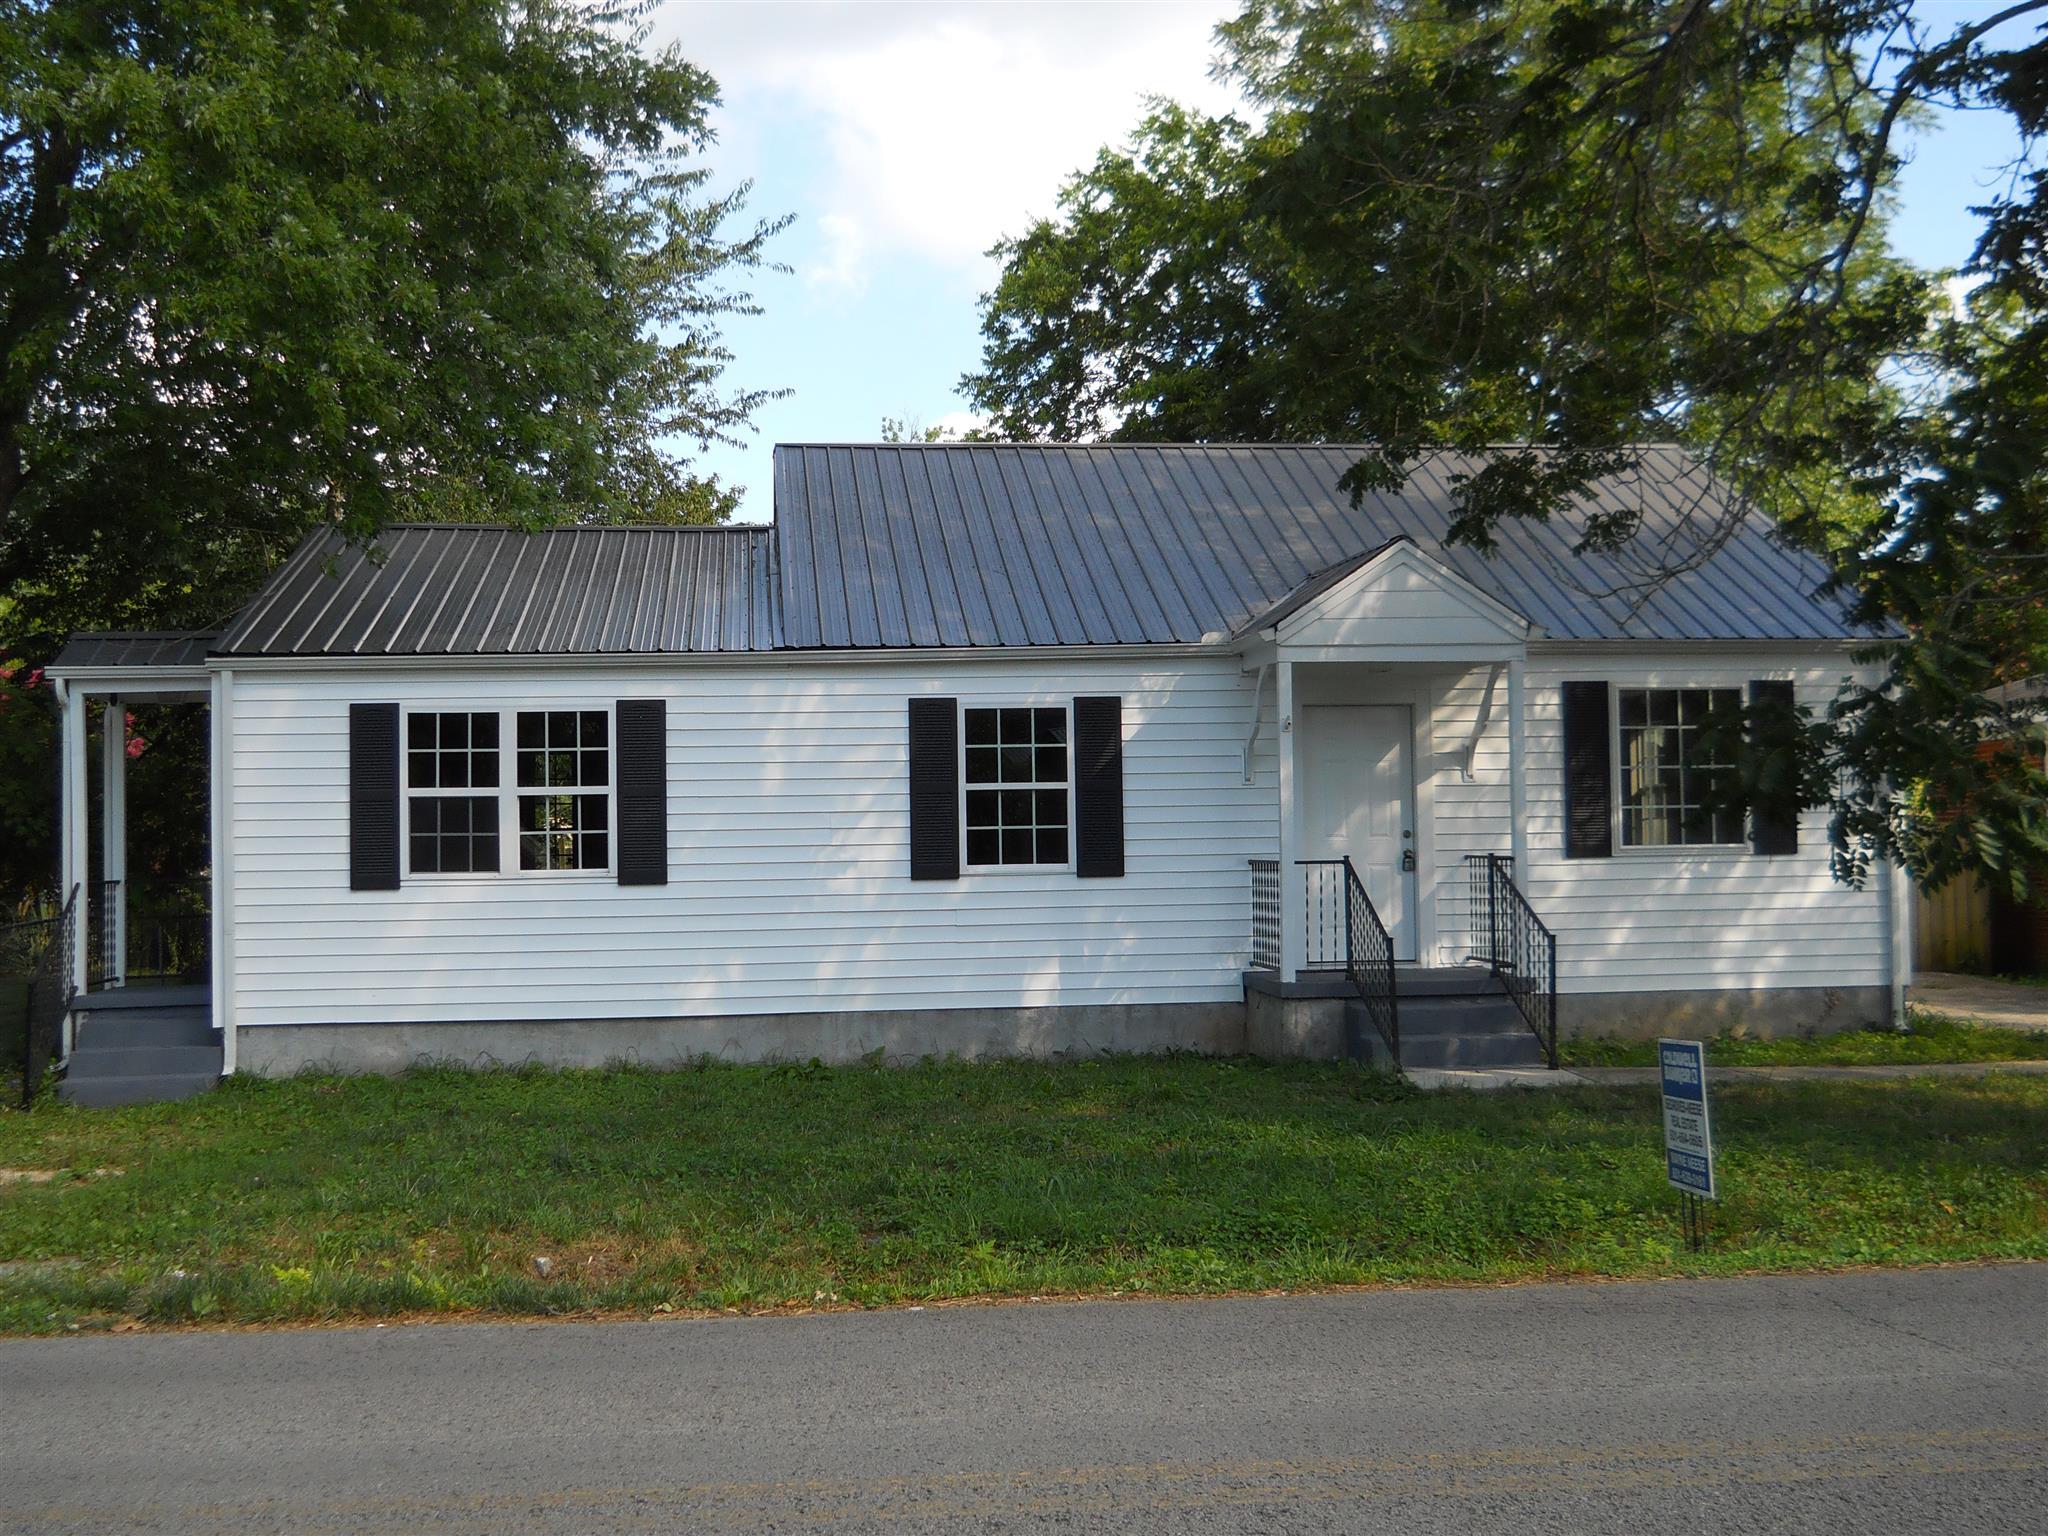 407 W Grundy St, Tullahoma, TN 37388 - Tullahoma, TN real estate listing